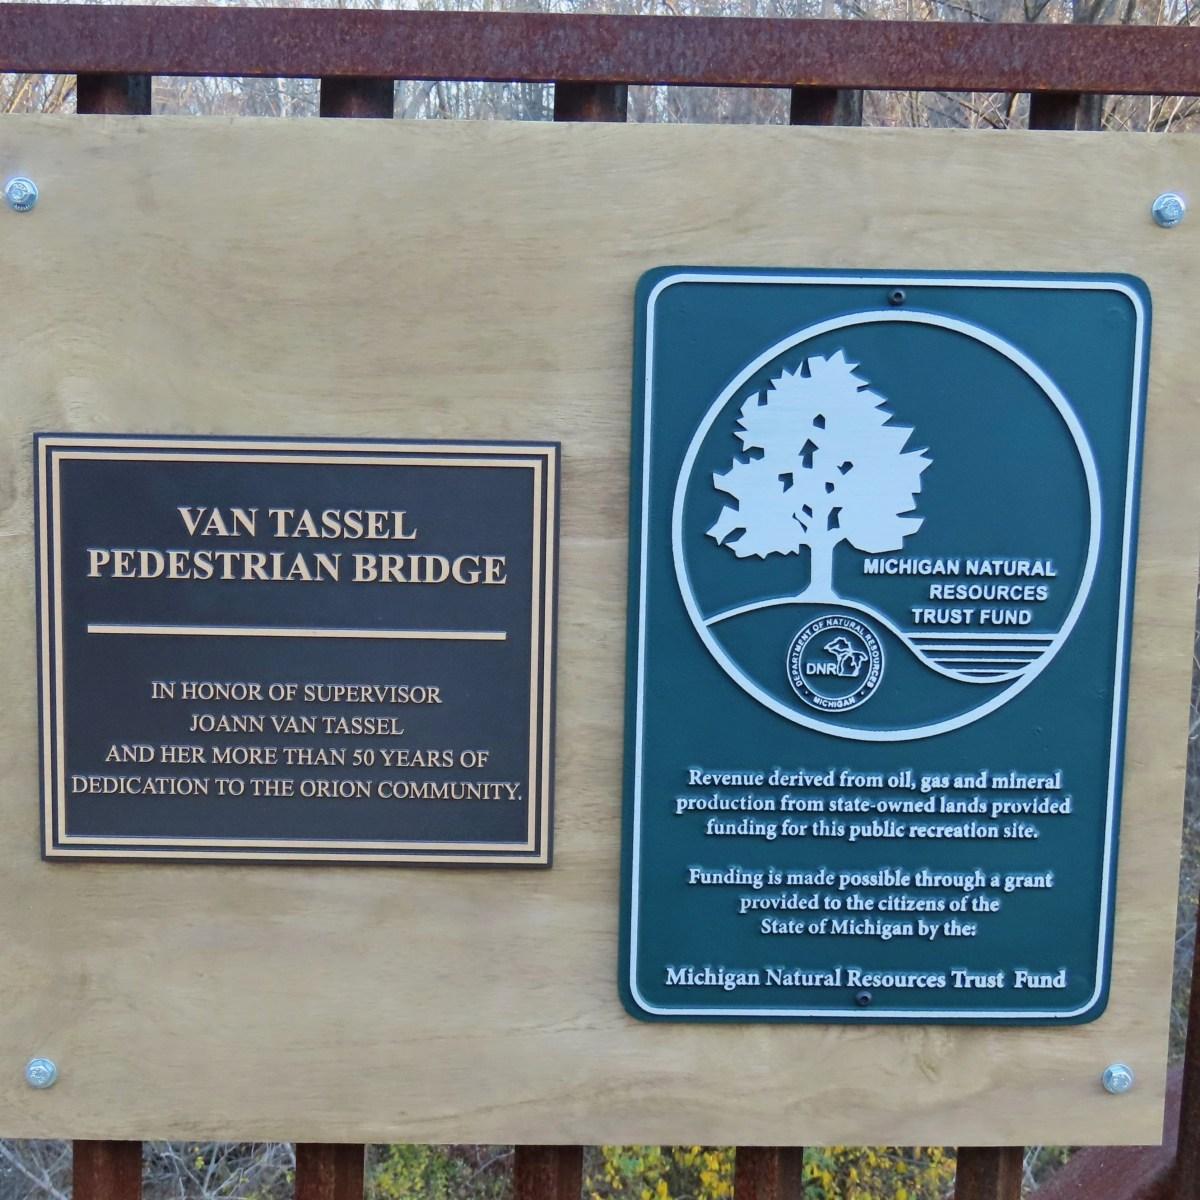 Van Tassel Pedestrian Bridge Dedication Sign